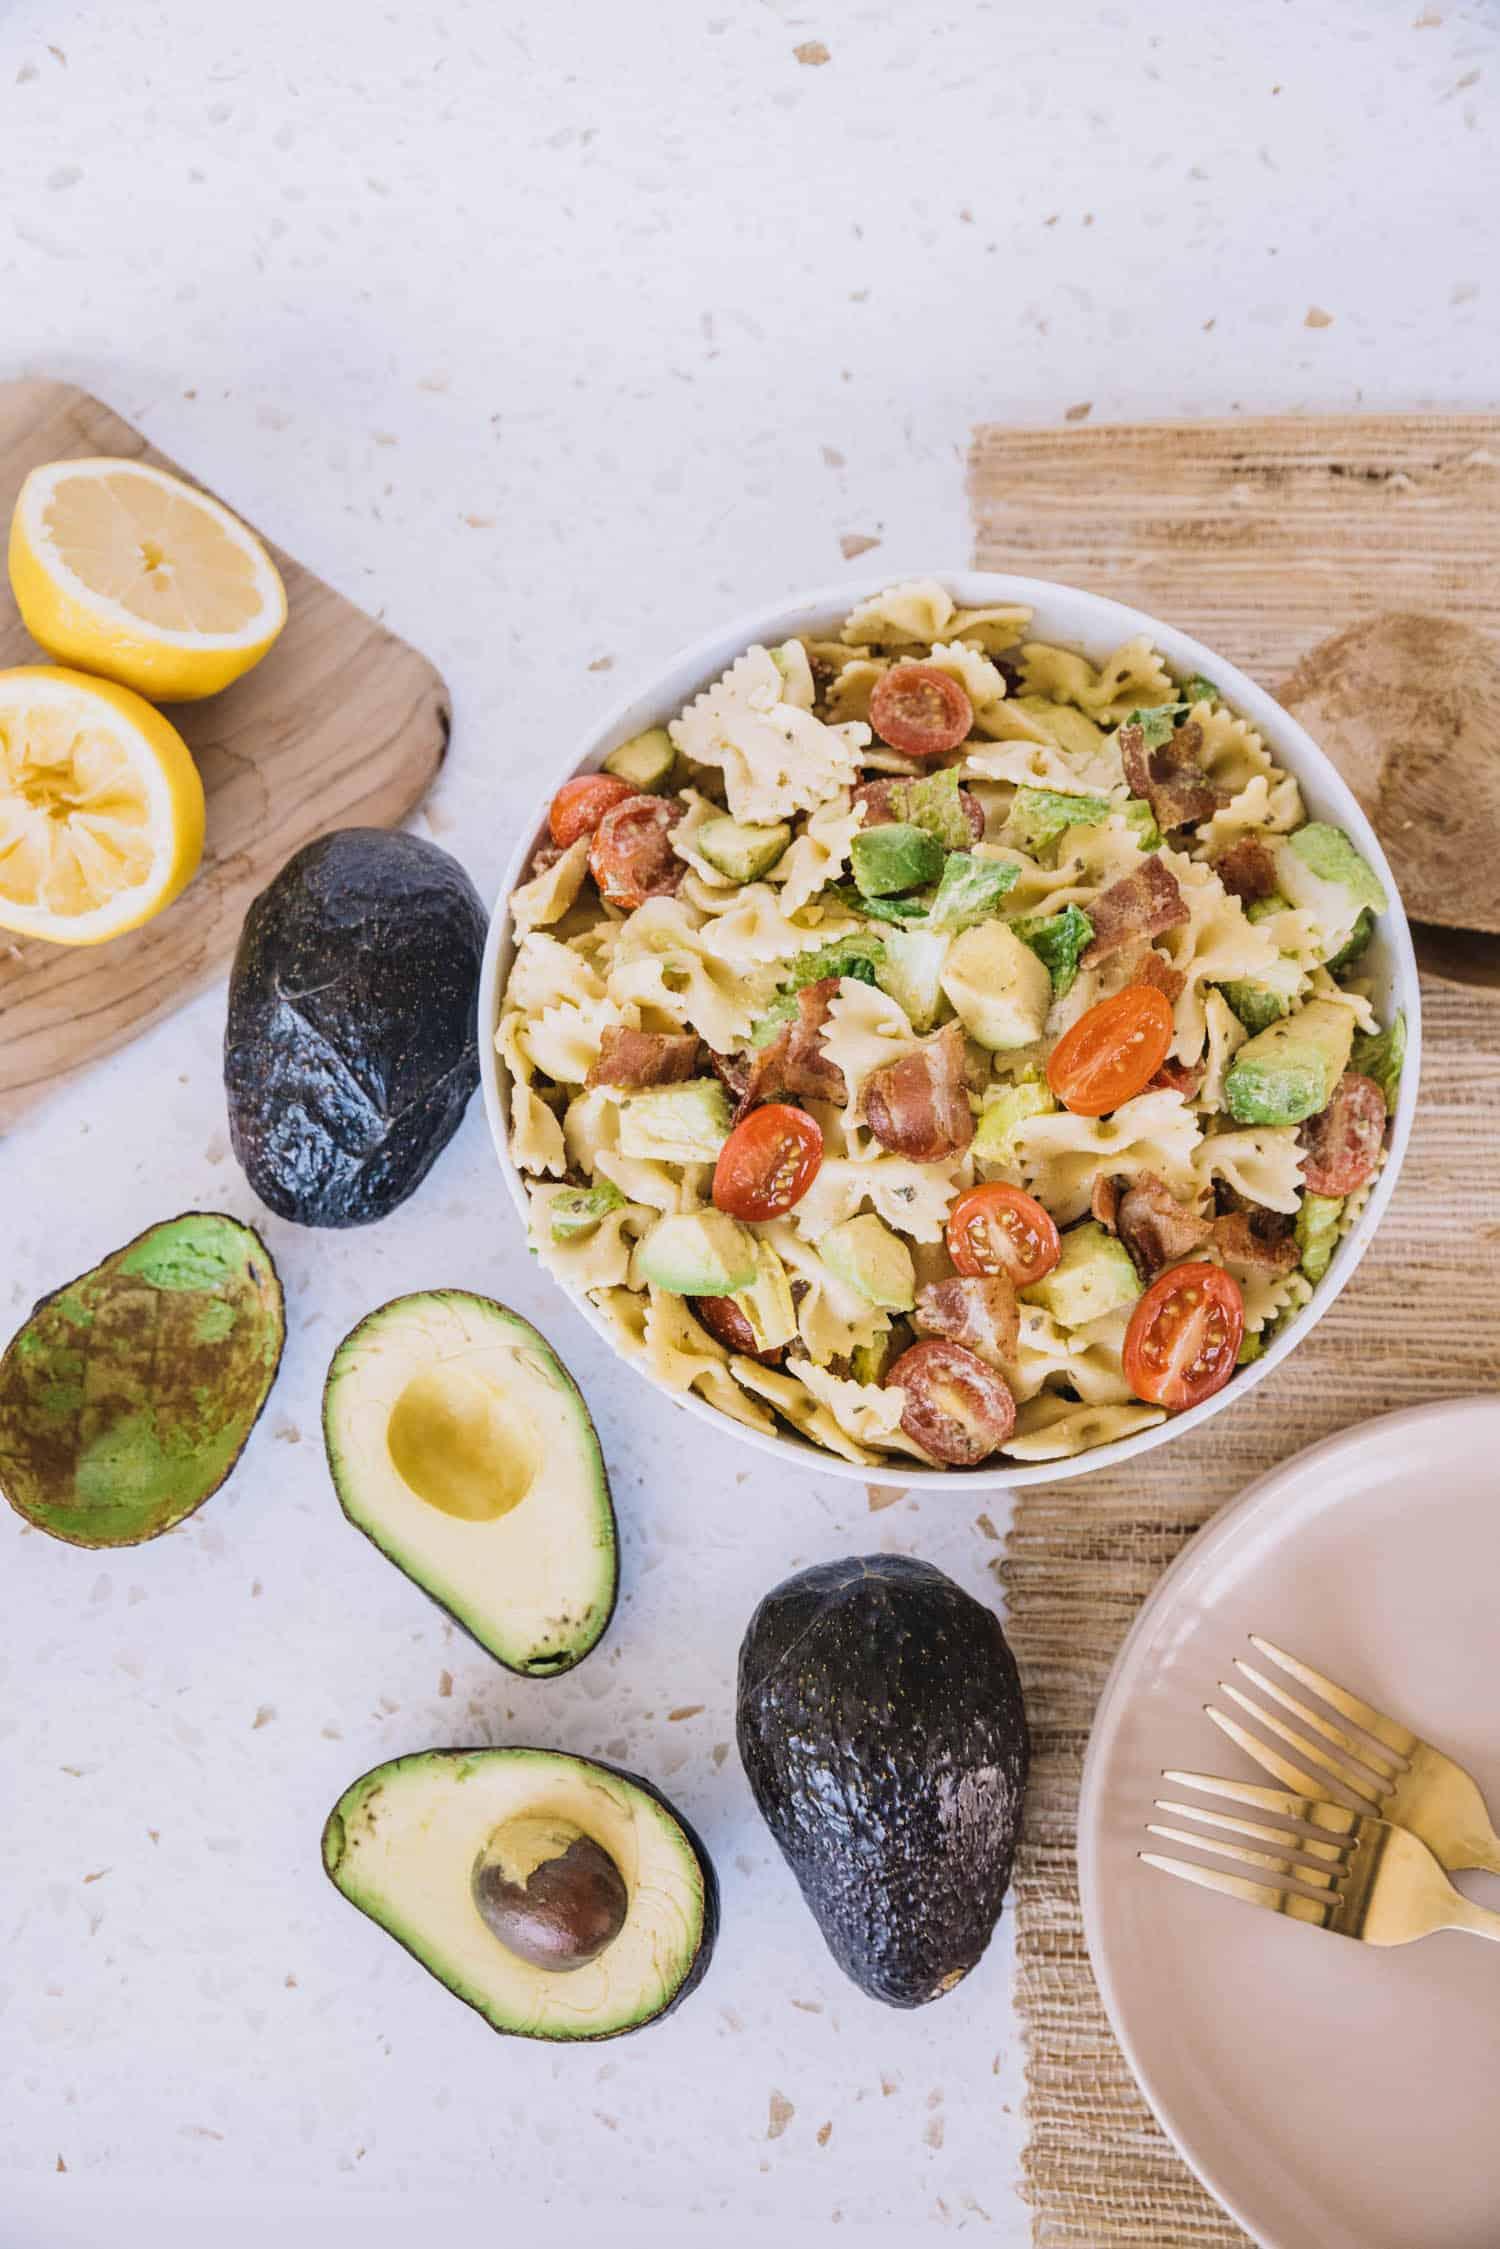 BLT Pasta Salad With Avocado recipe